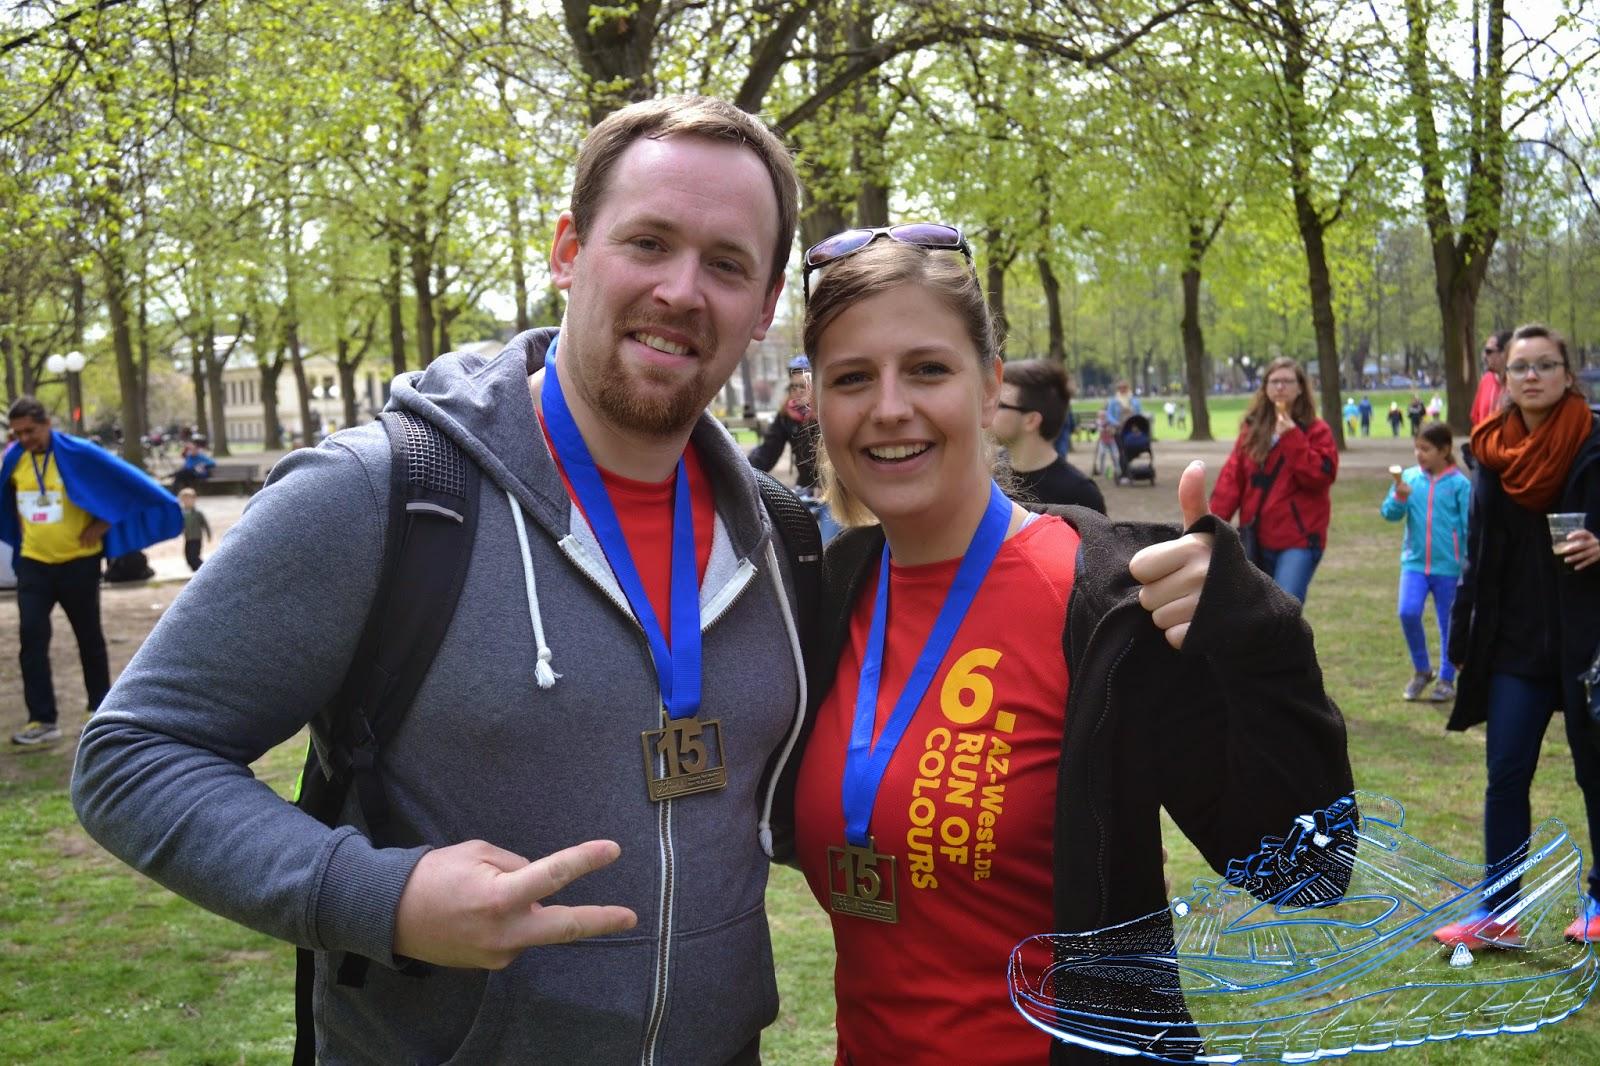 http://meckycaro.blogspot.de/2015/04/wettkampf-deutsche-post-marathon-bonn.html